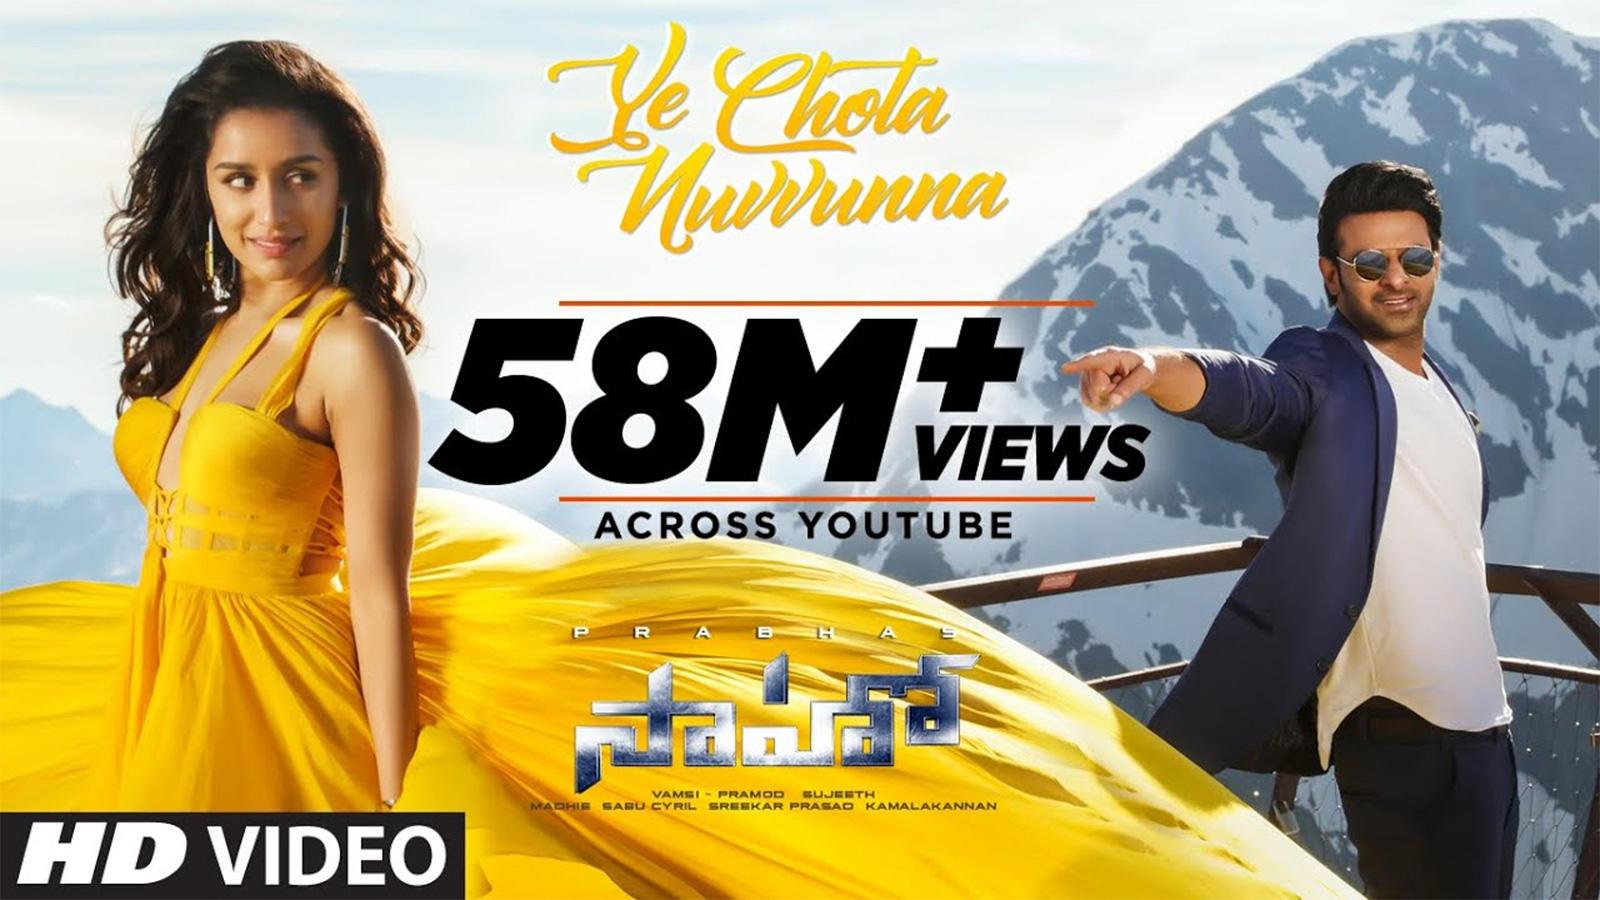 Telugu Song: Latest Telugu Video Song 'Ye Chota Nuvvunna' from 'Saaho' Ft. Prabhas and Shraddha Kapoor